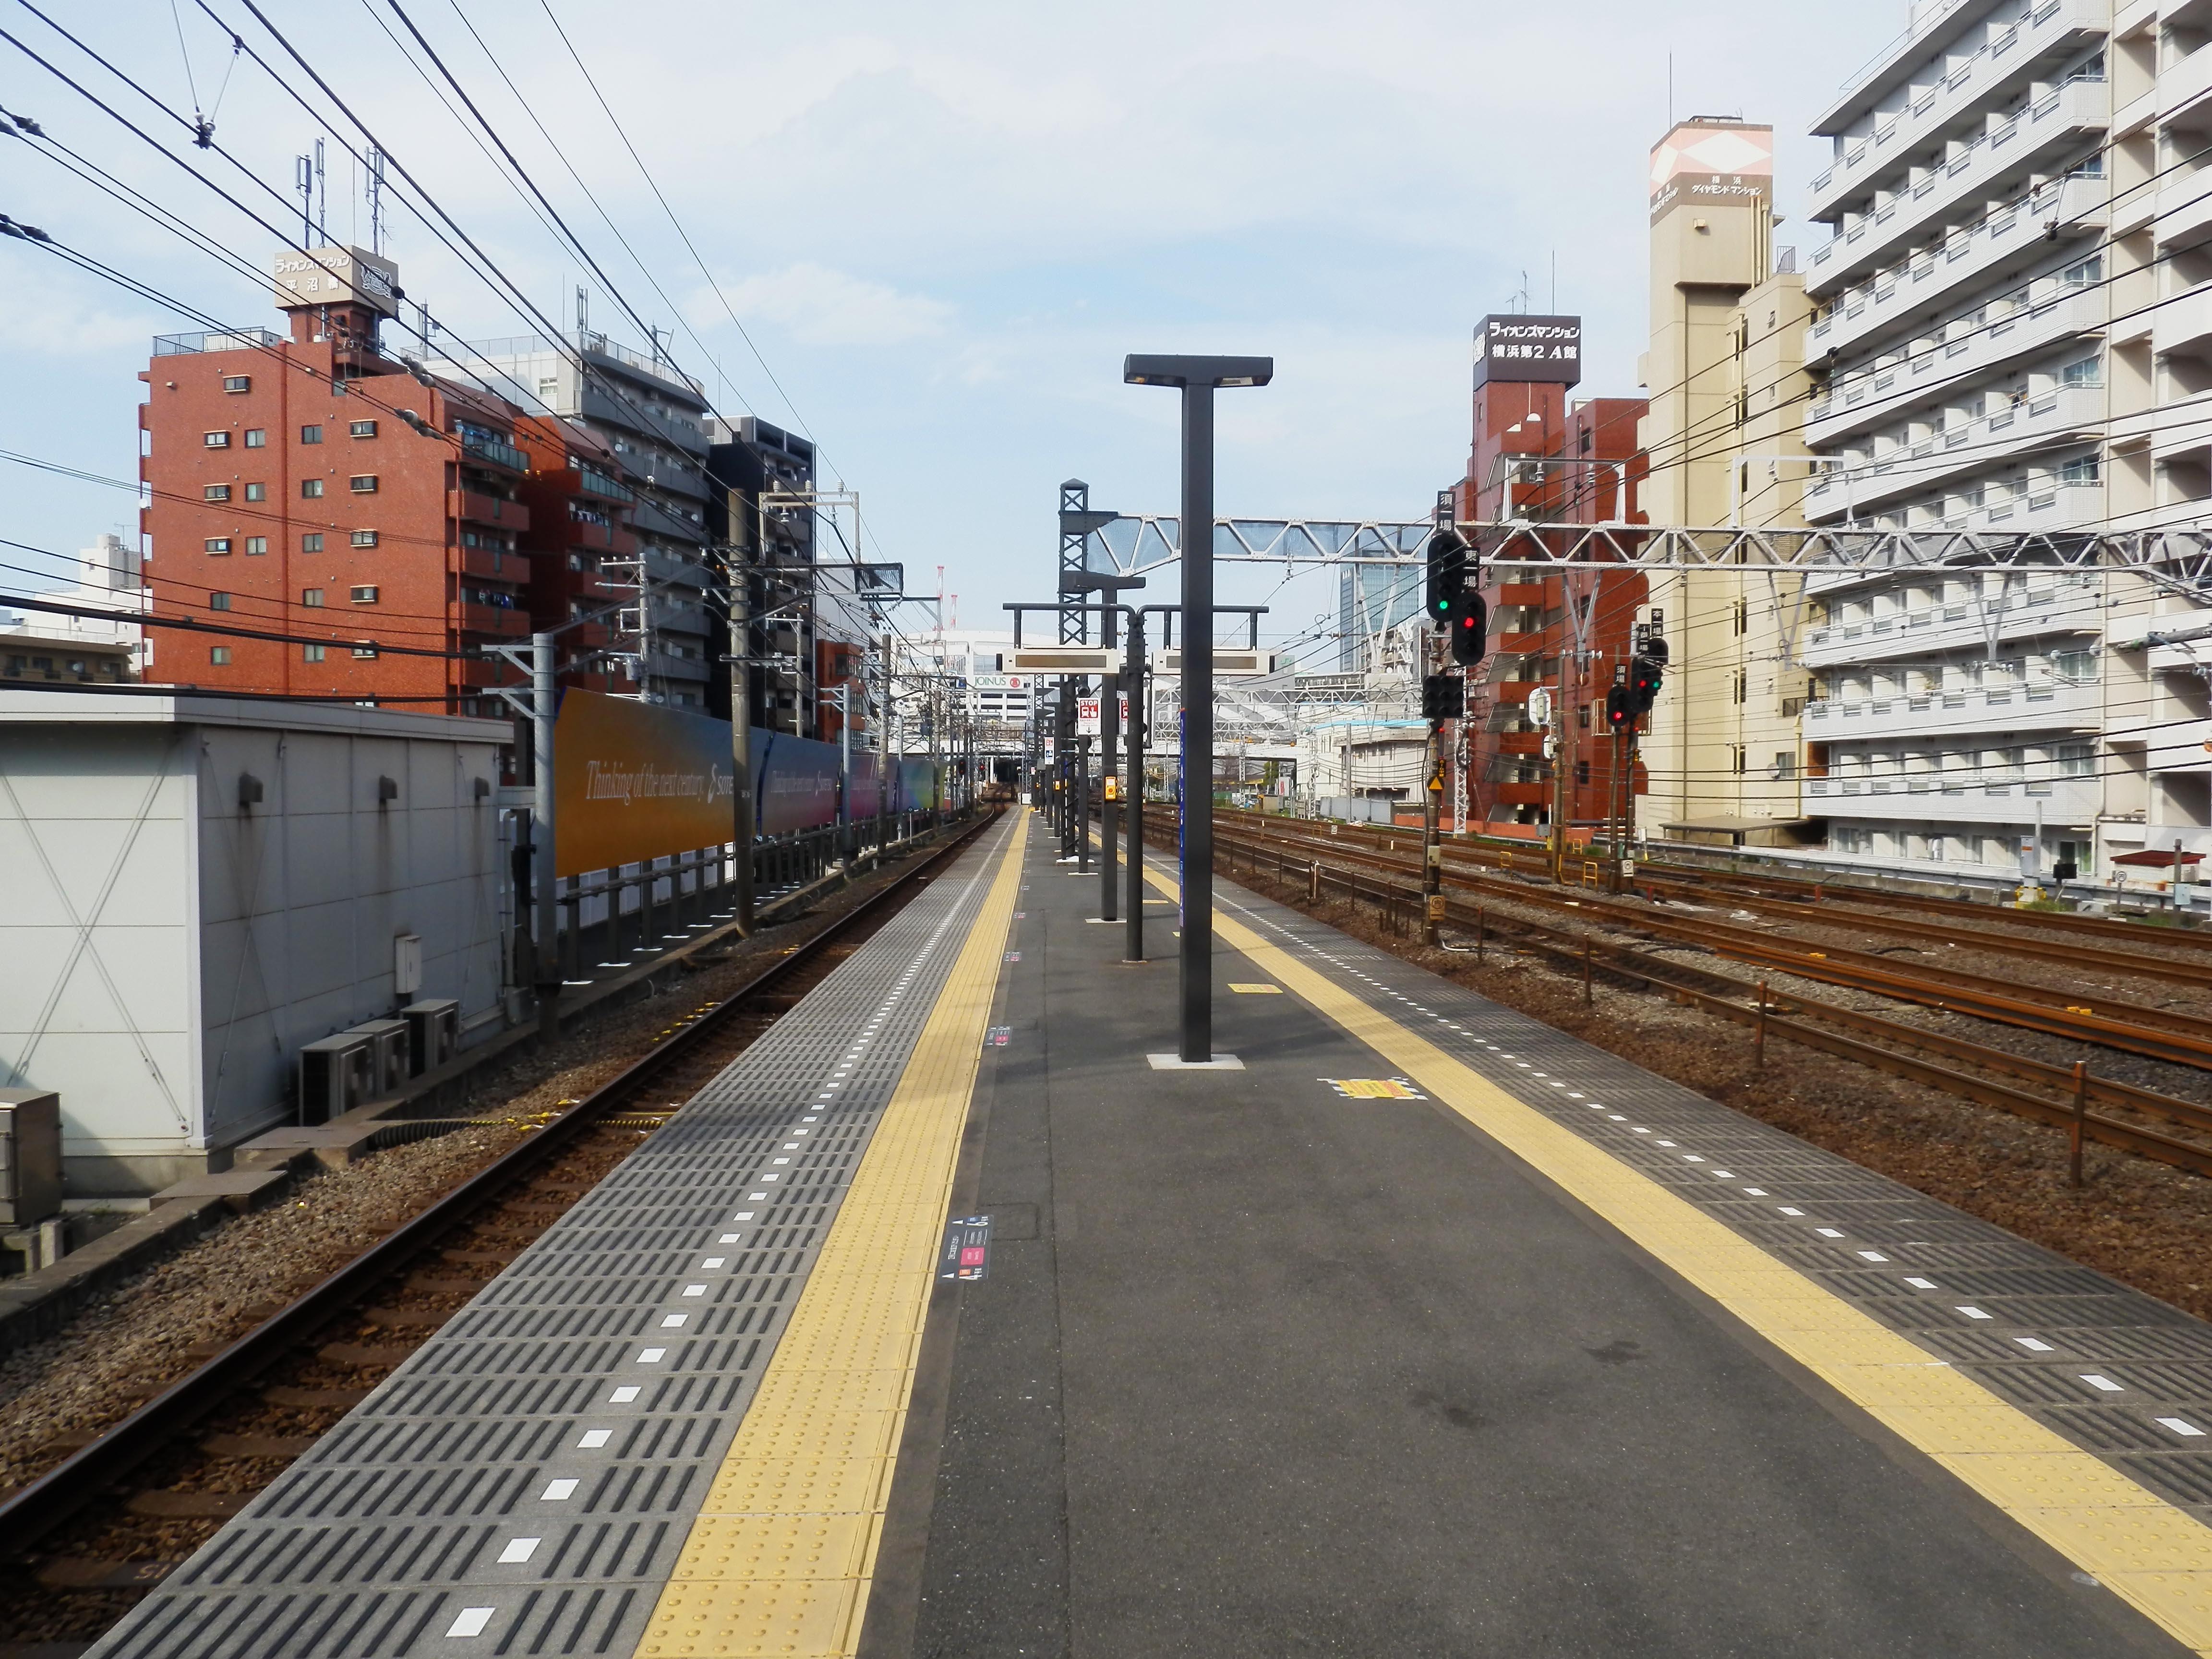 https://upload.wikimedia.org/wikipedia/commons/0/08/Hiranumabashi_station_platform_20170416.jpg